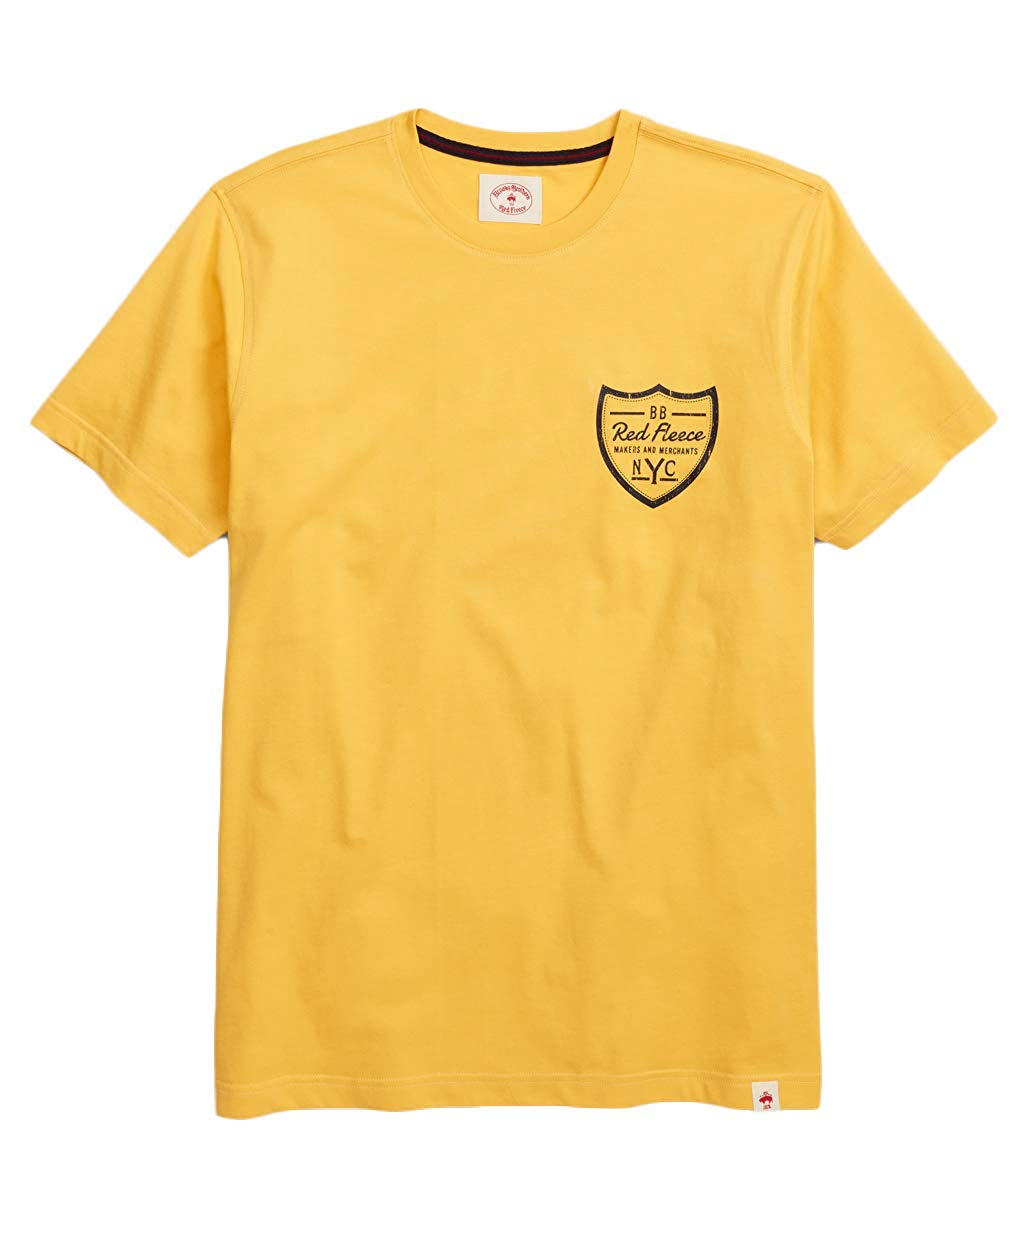 BrooksBrothersの半袖Tシャツ レッドフリース